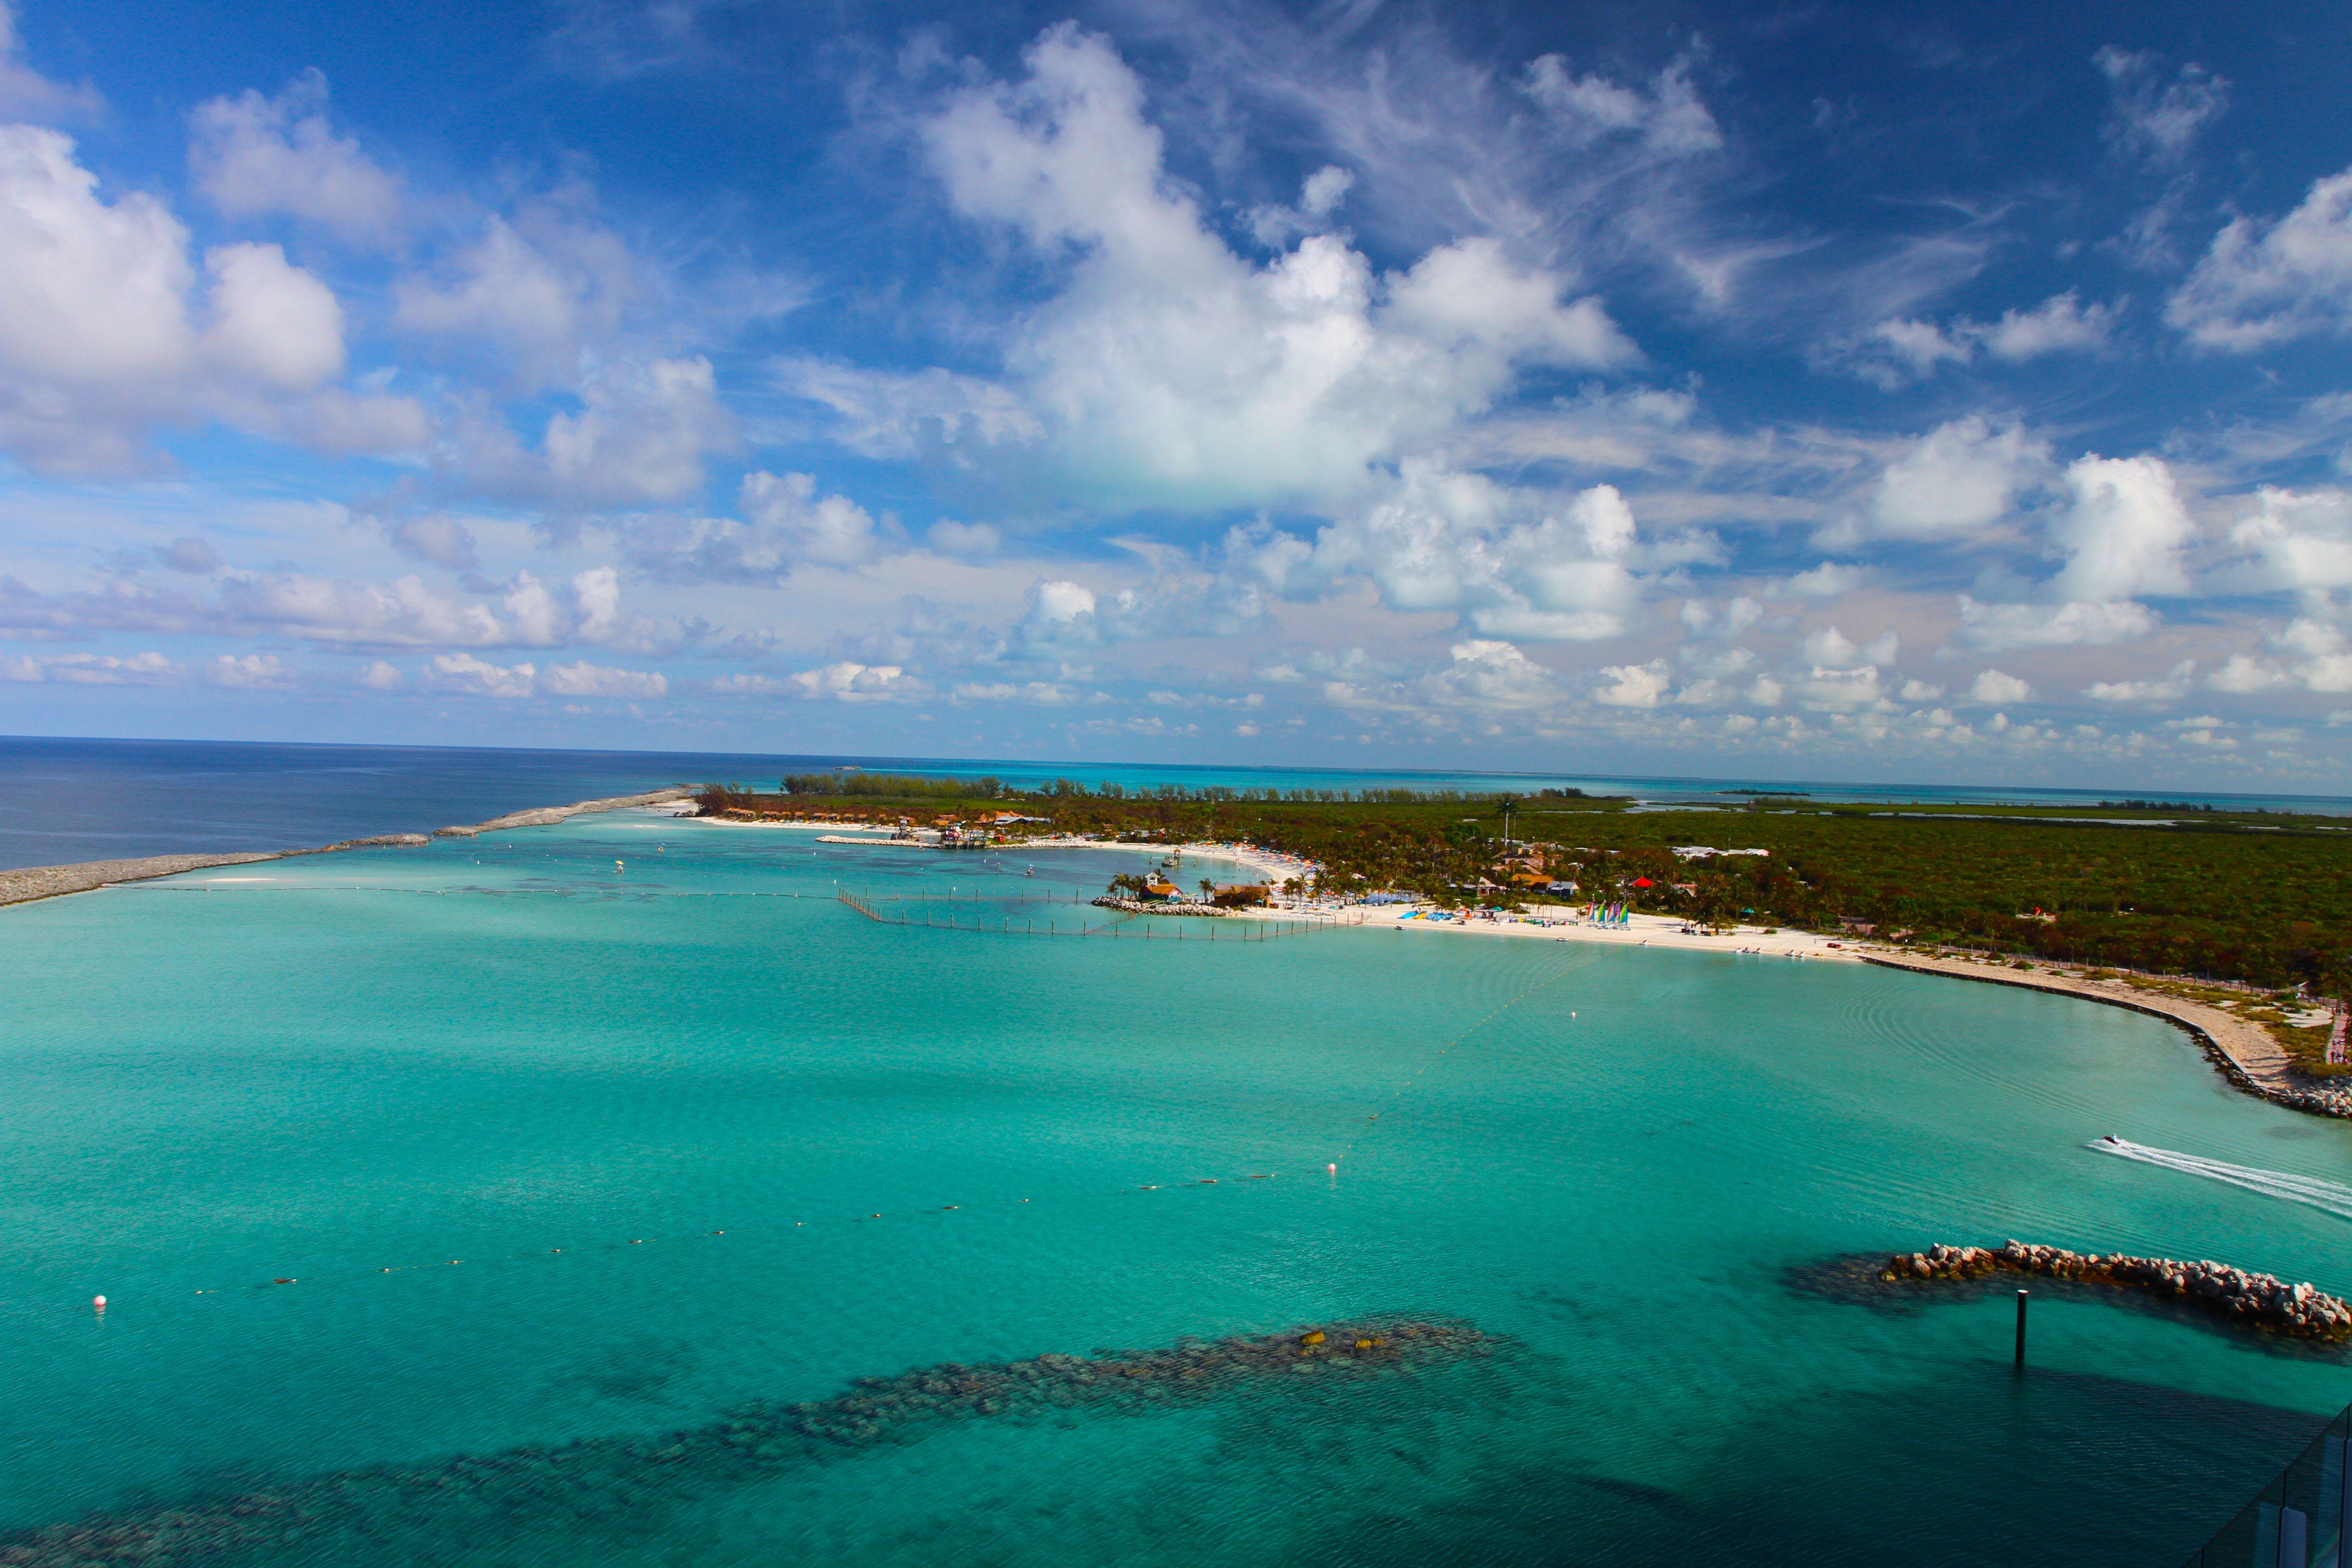 Castaway Cay Disney S Private Island In The Bahamas Paisajes